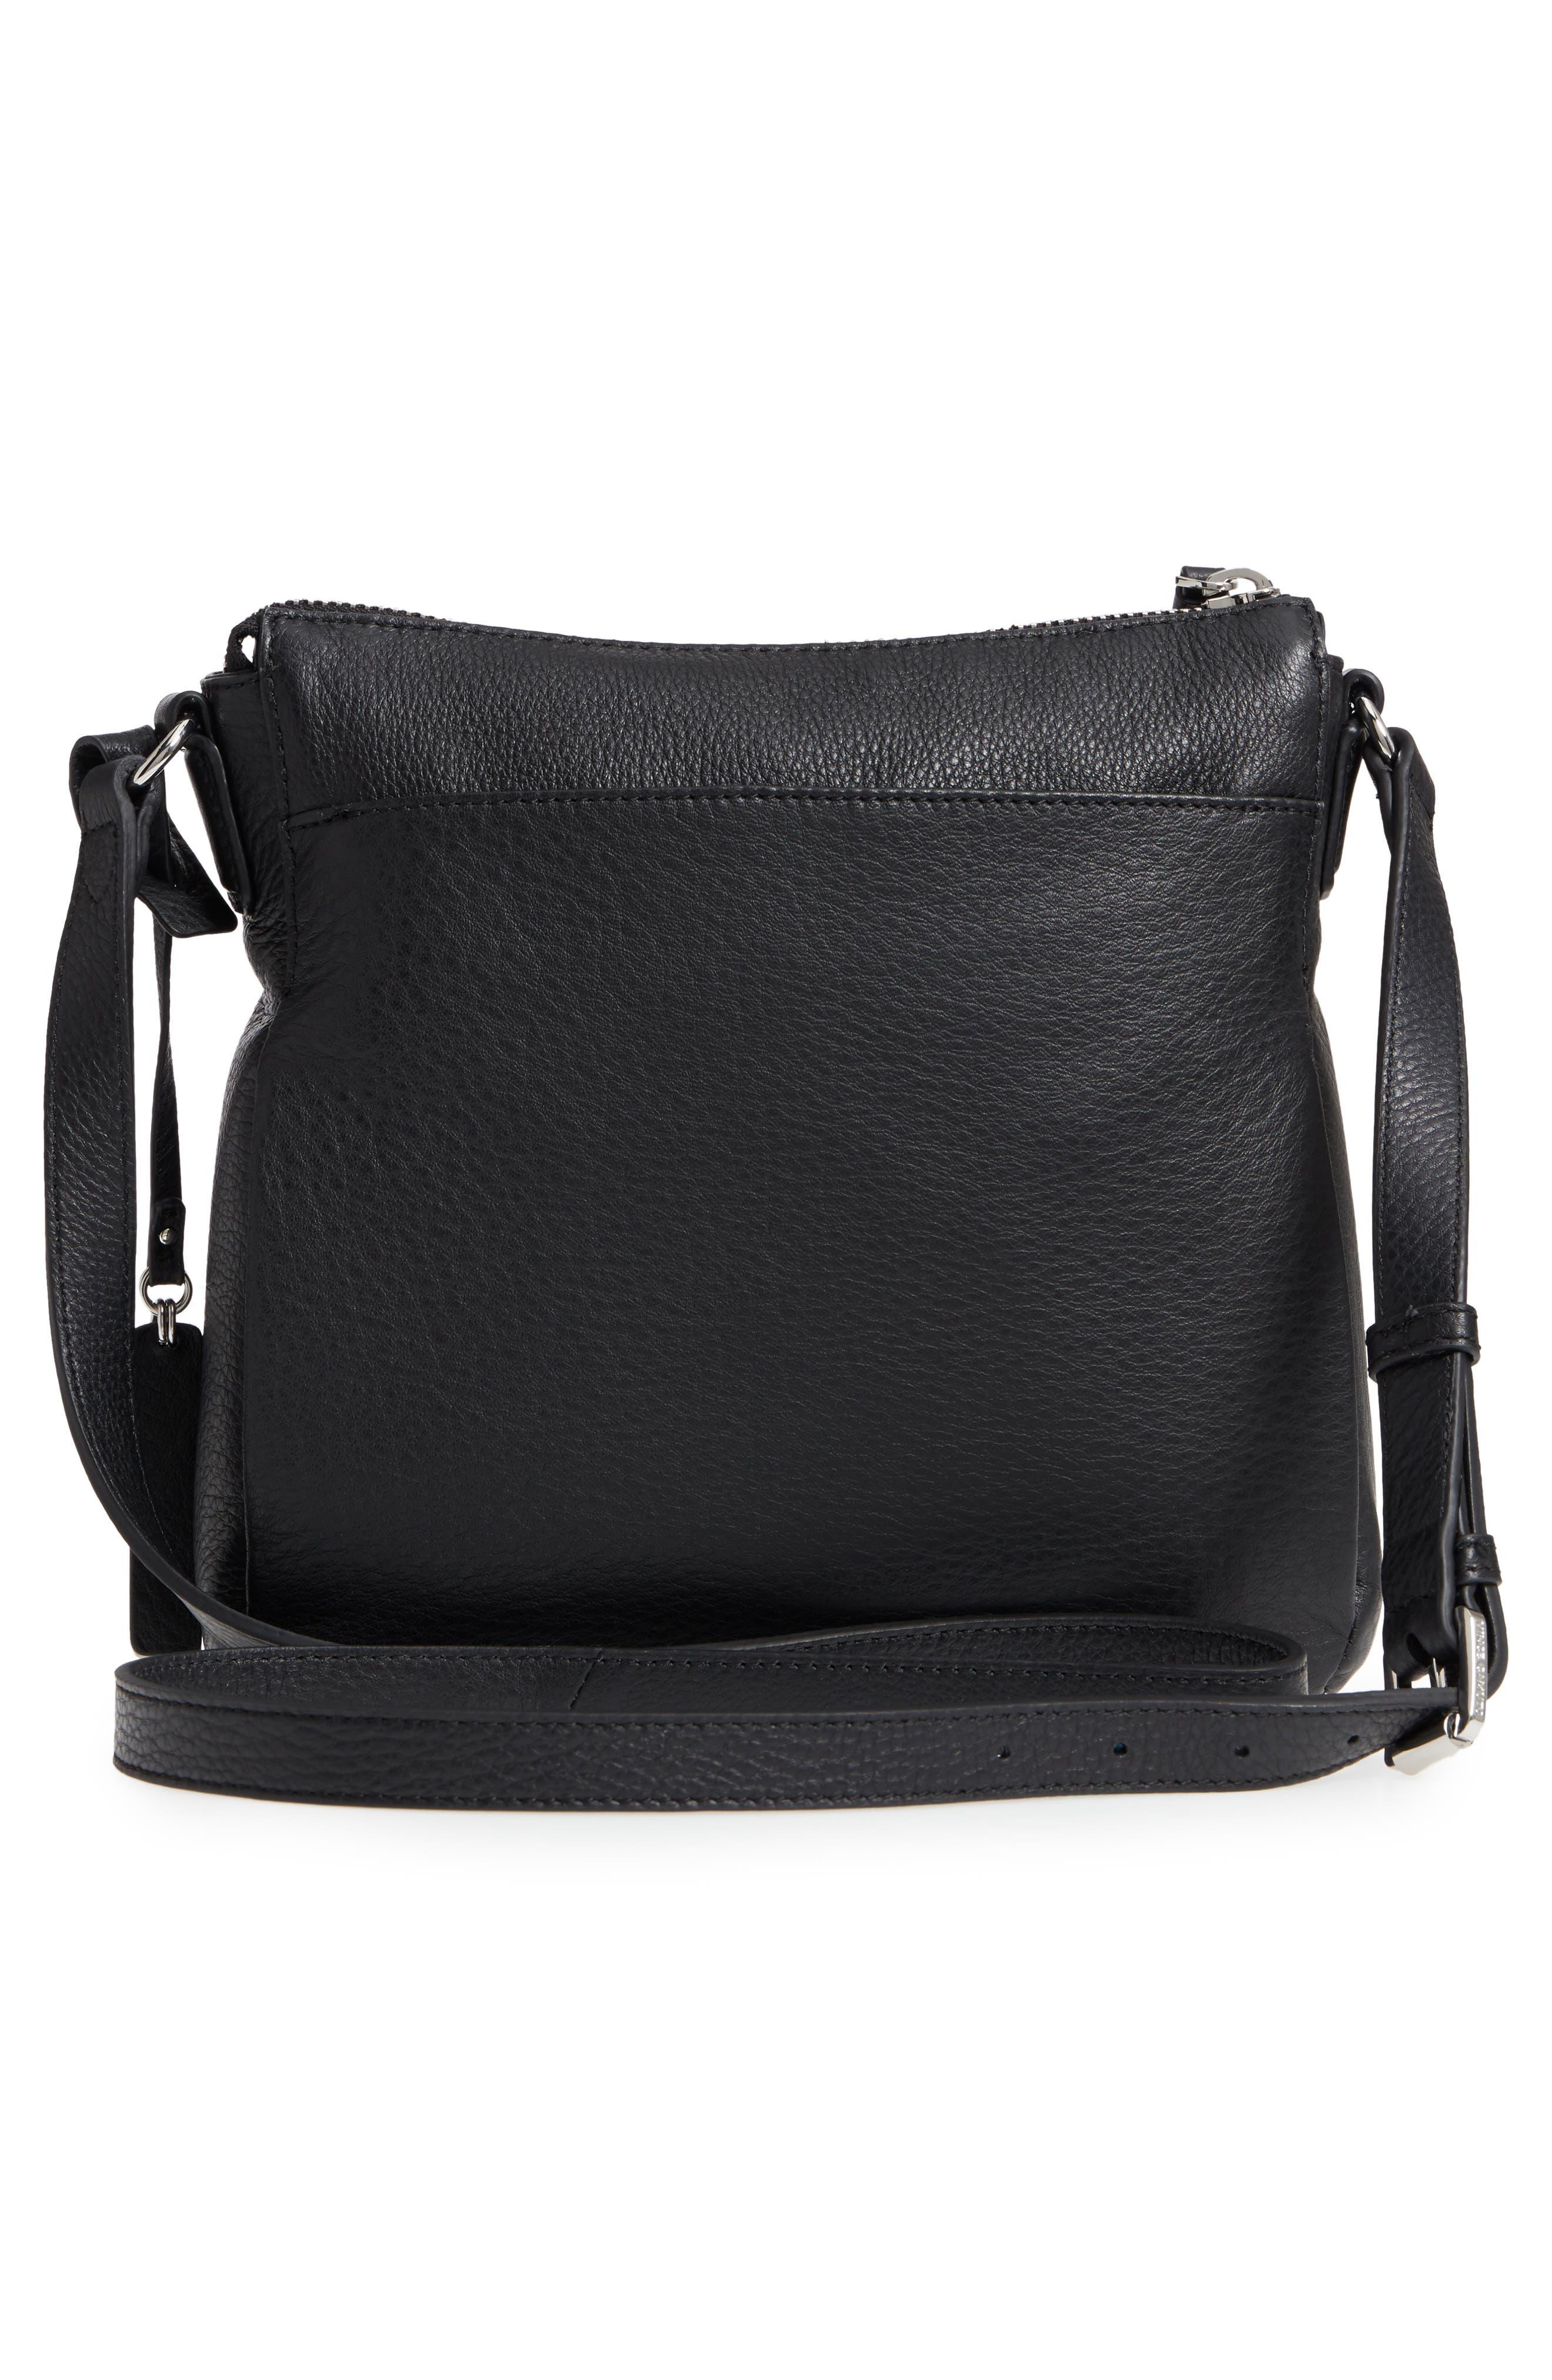 Staja Leather Crossbody Bag,                             Alternate thumbnail 4, color,                             Nero